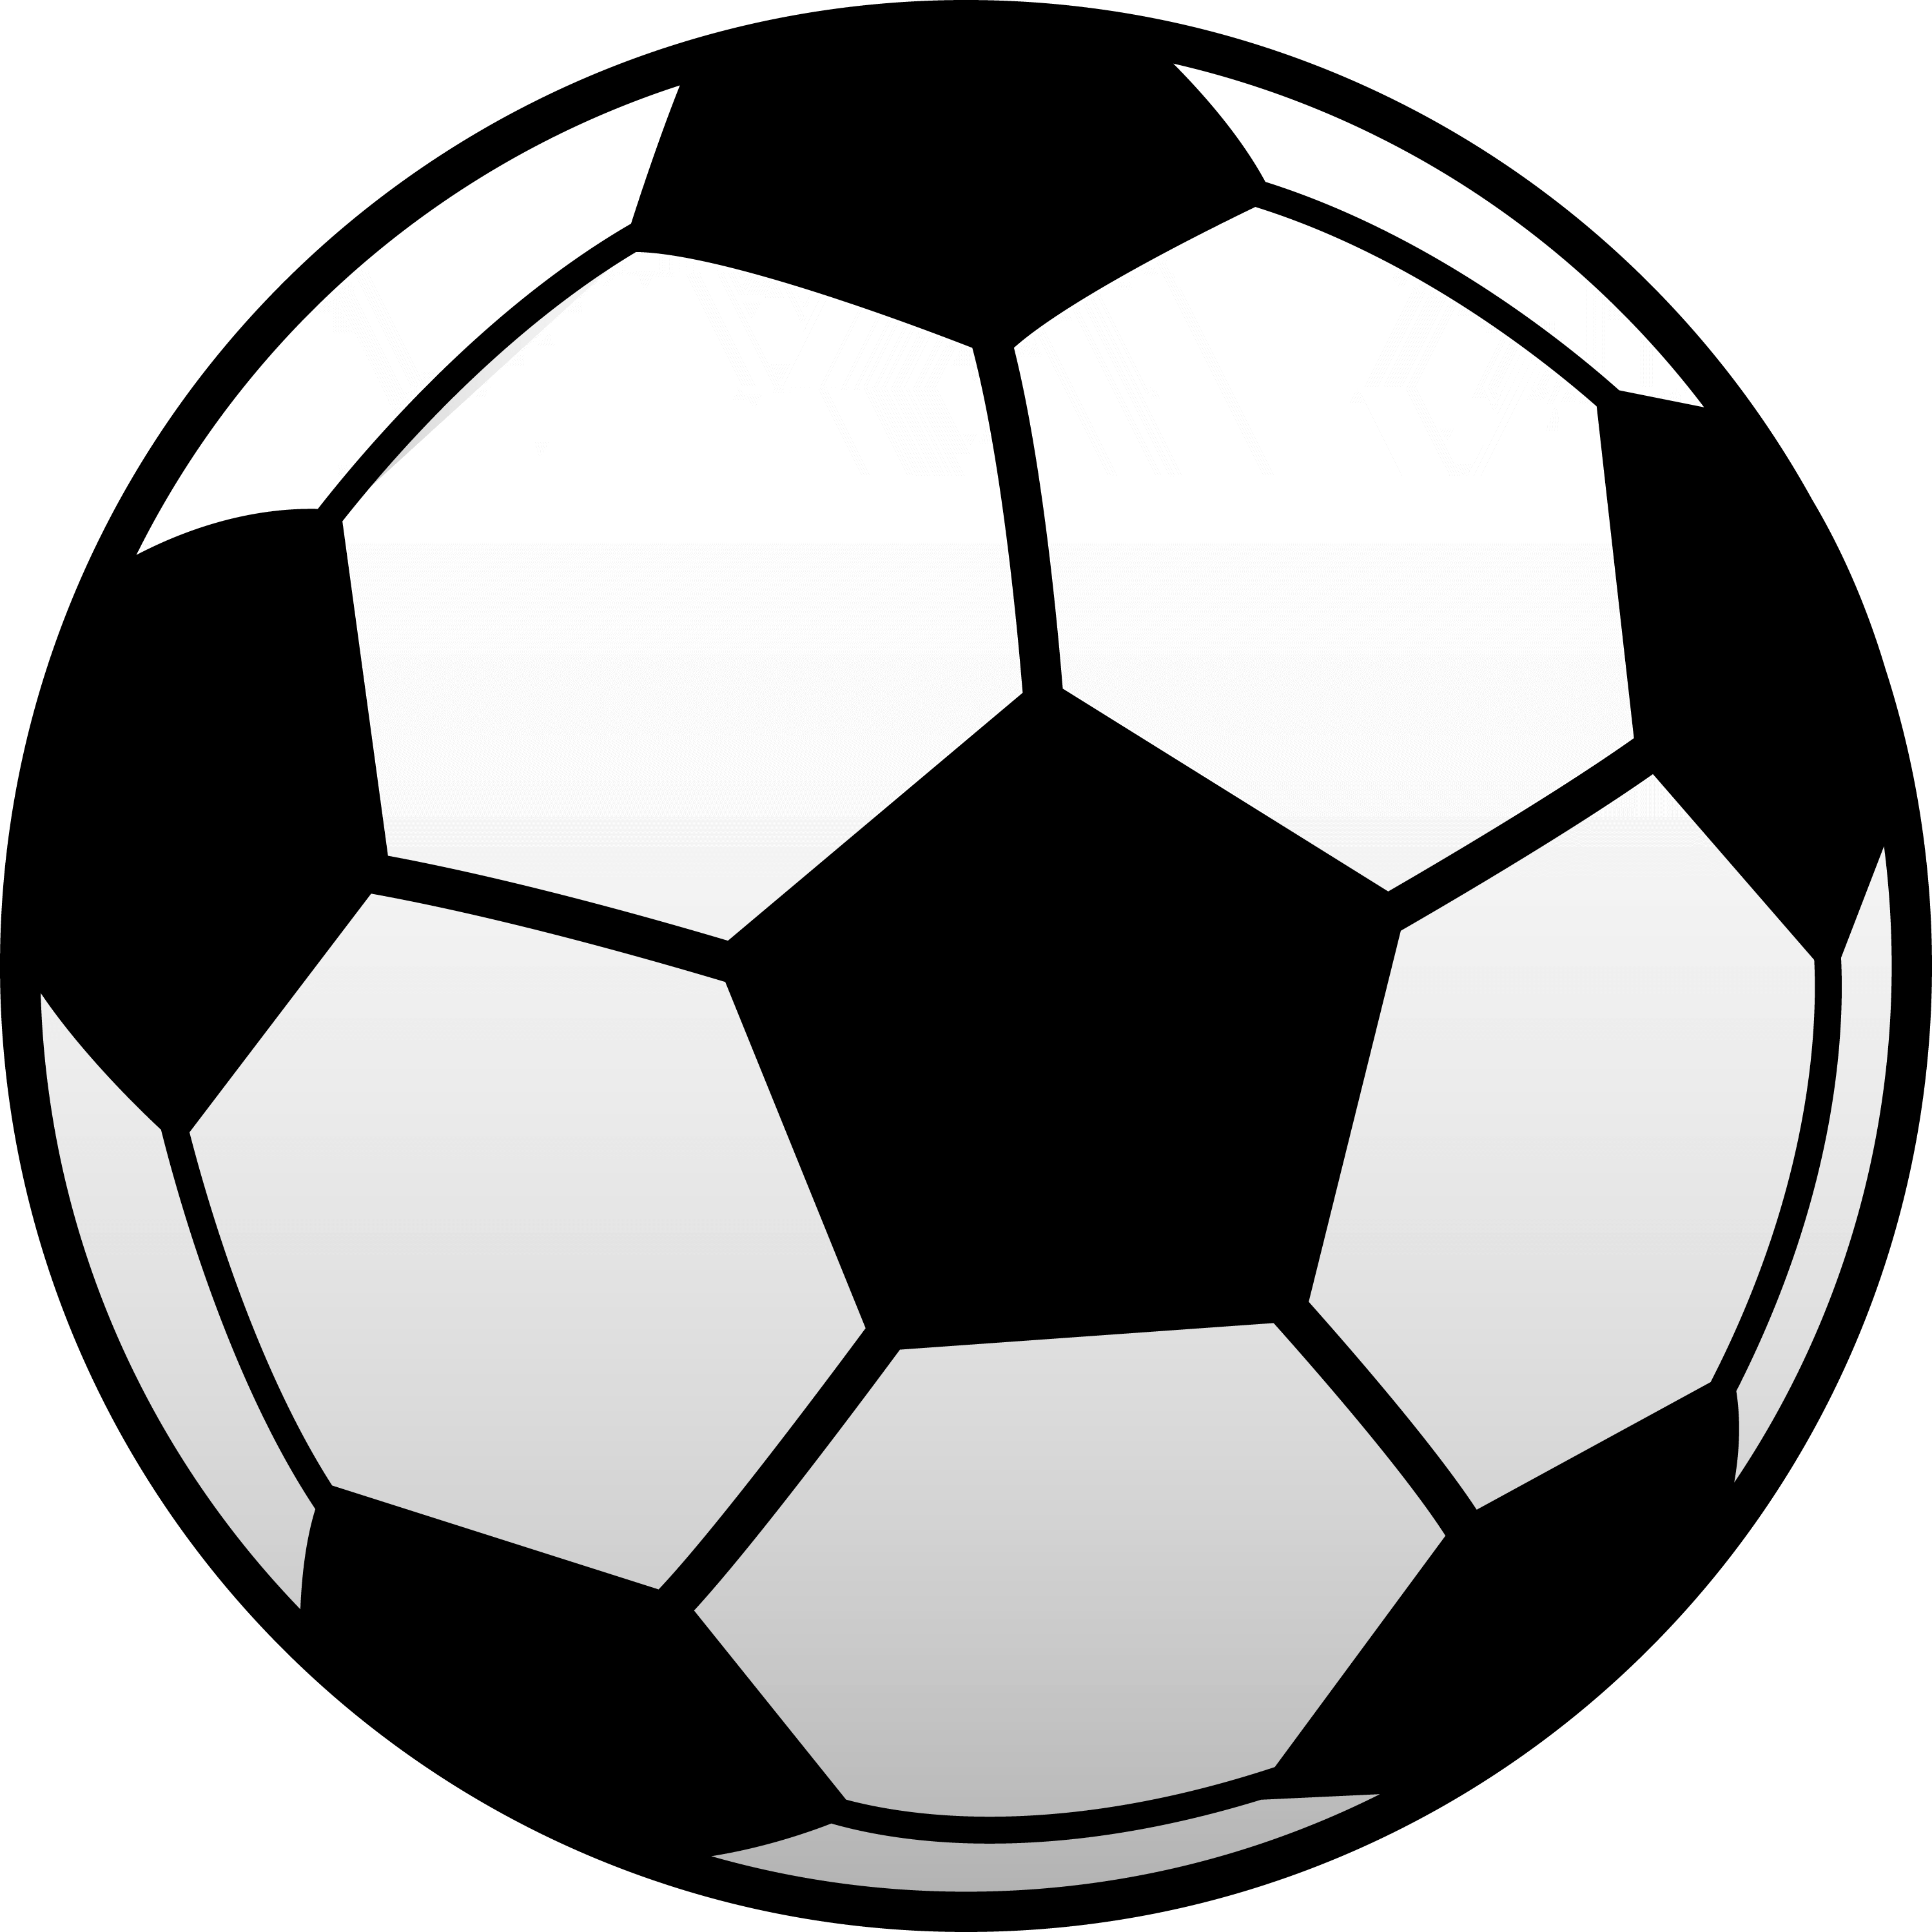 Free Sports Cliparts Microsoft, Download Free Clip Art, Free.